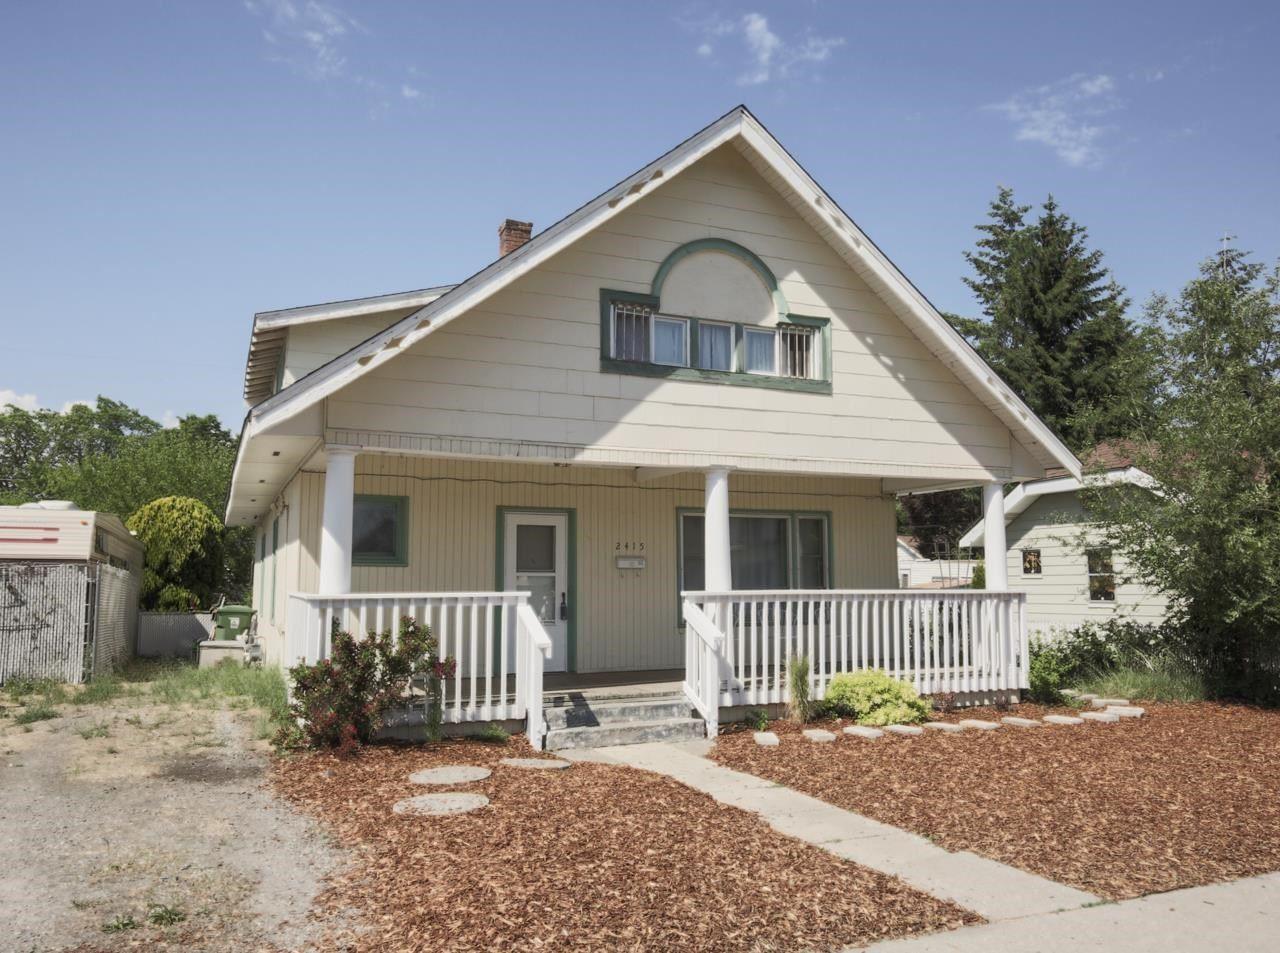 2415 E Queen Ave, Spokane, WA 99217 - #: 202116828